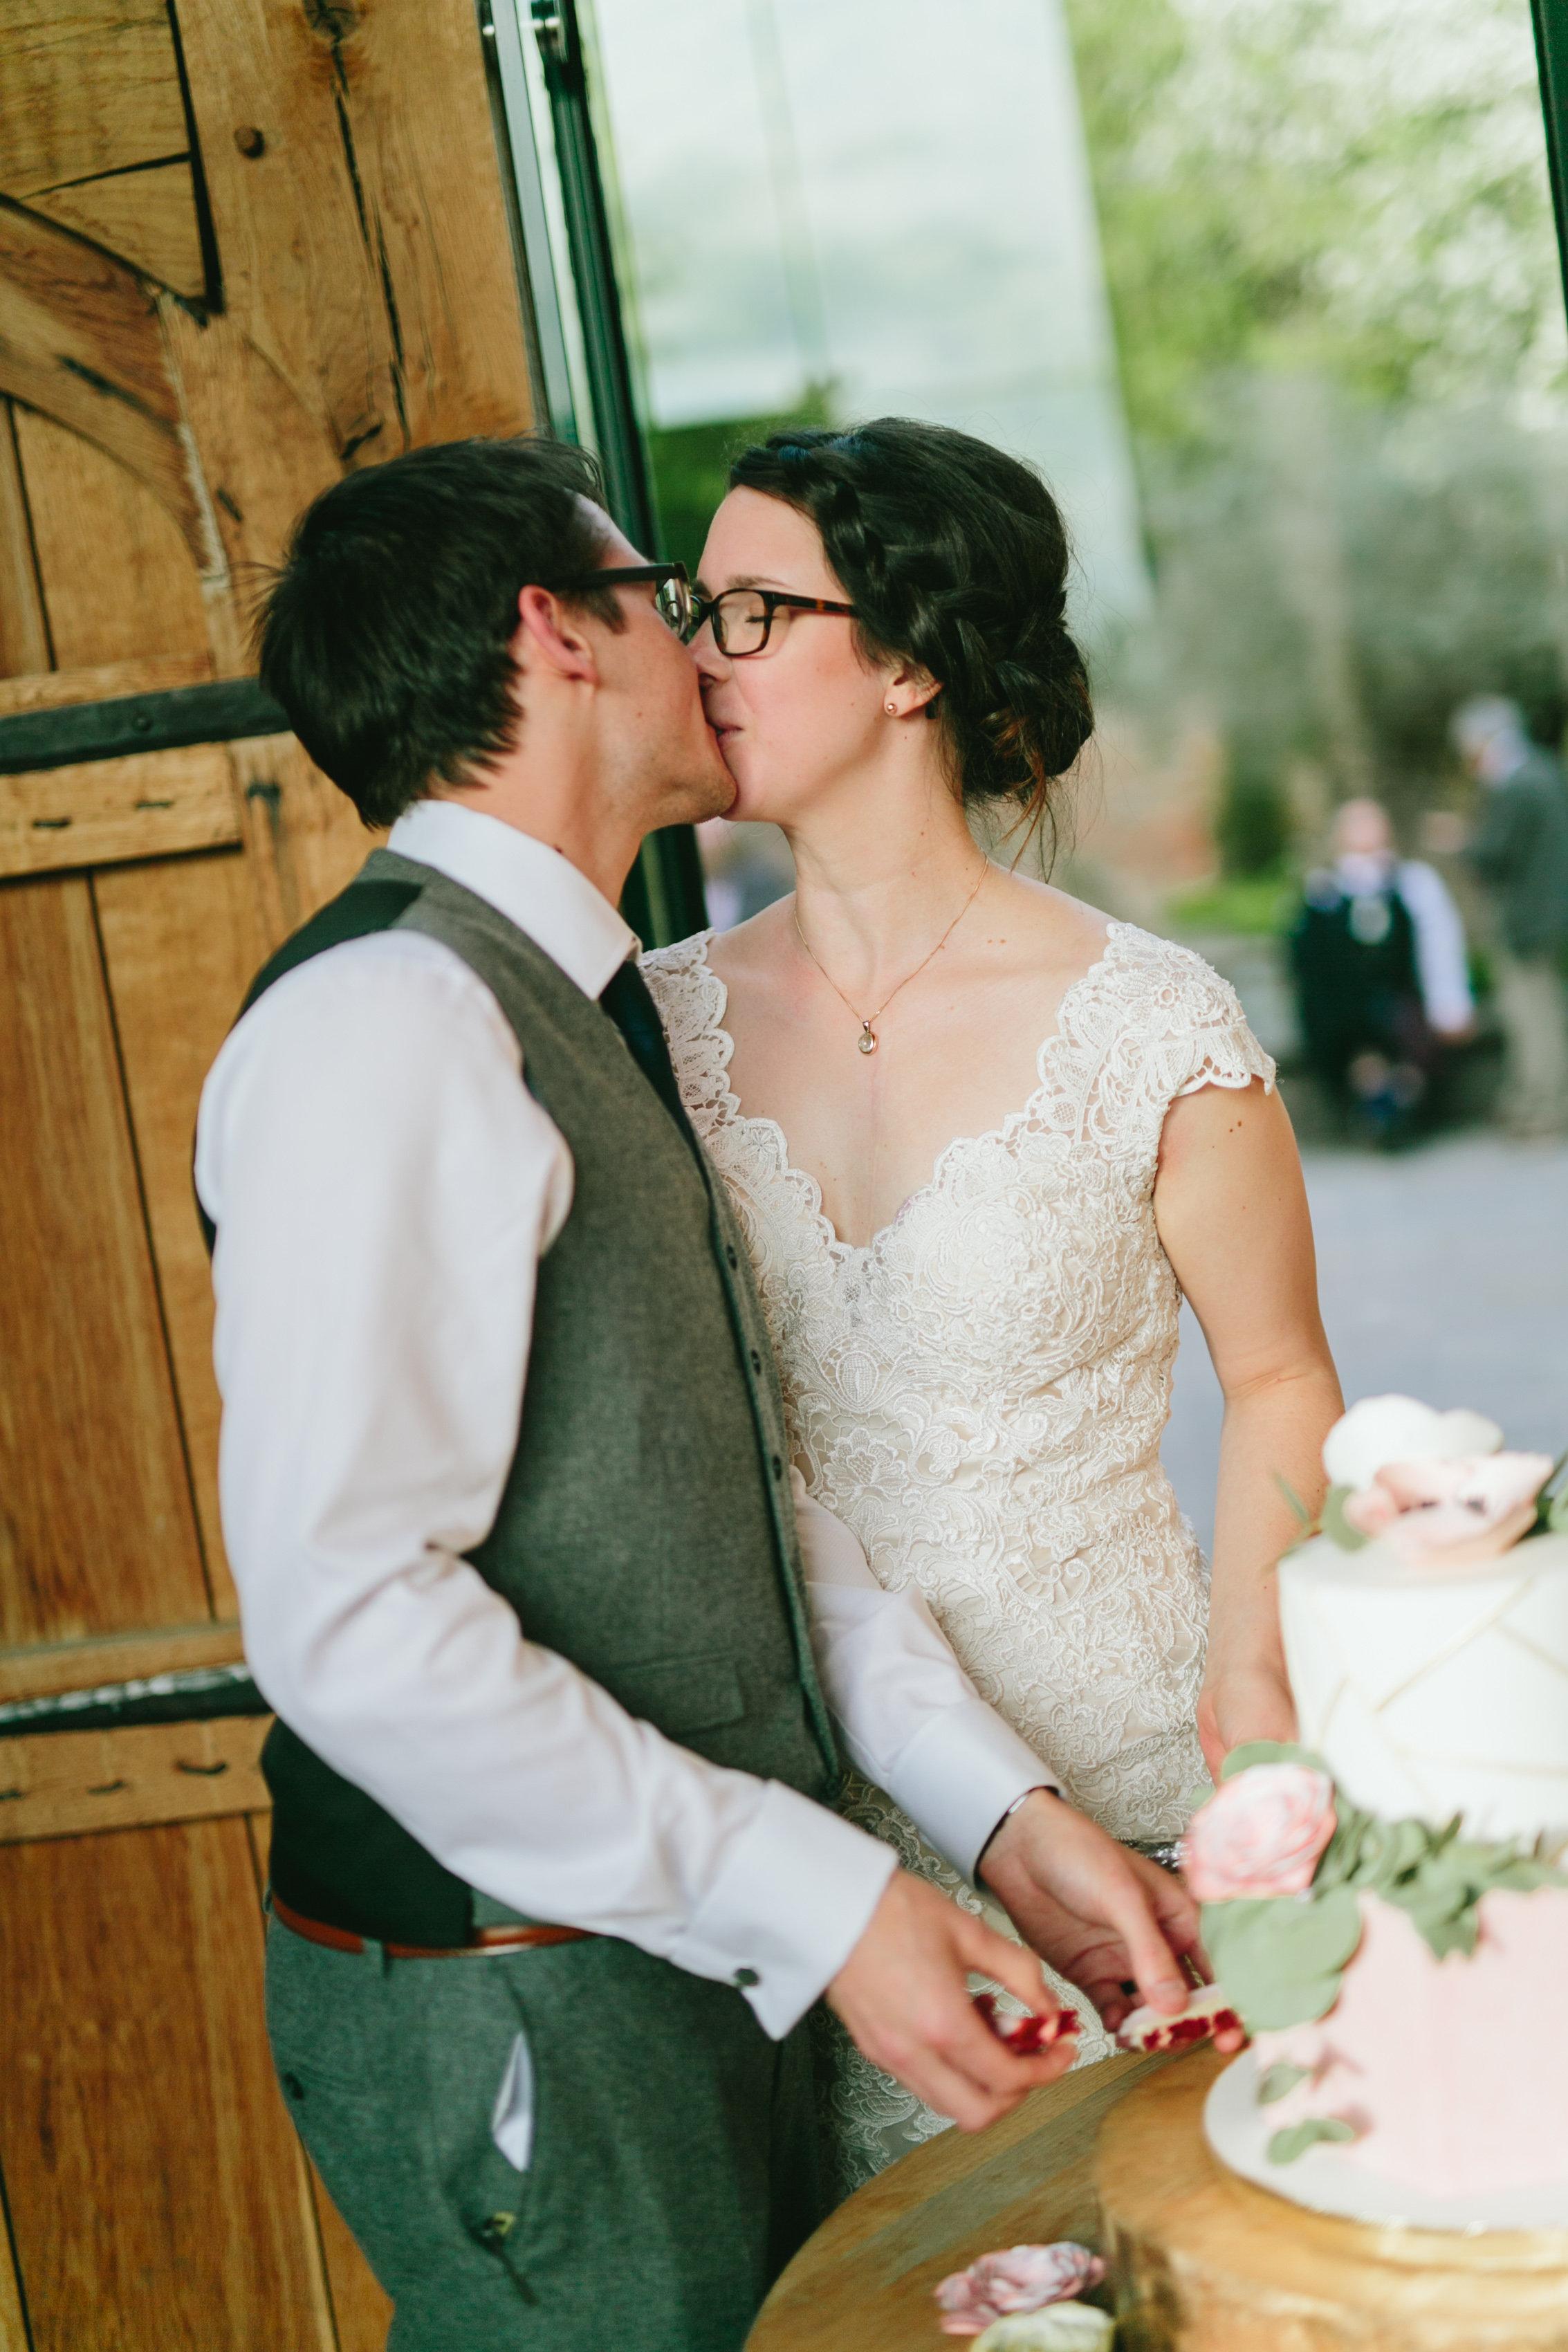 Geometric Wedding Cake - Amerton Cakes